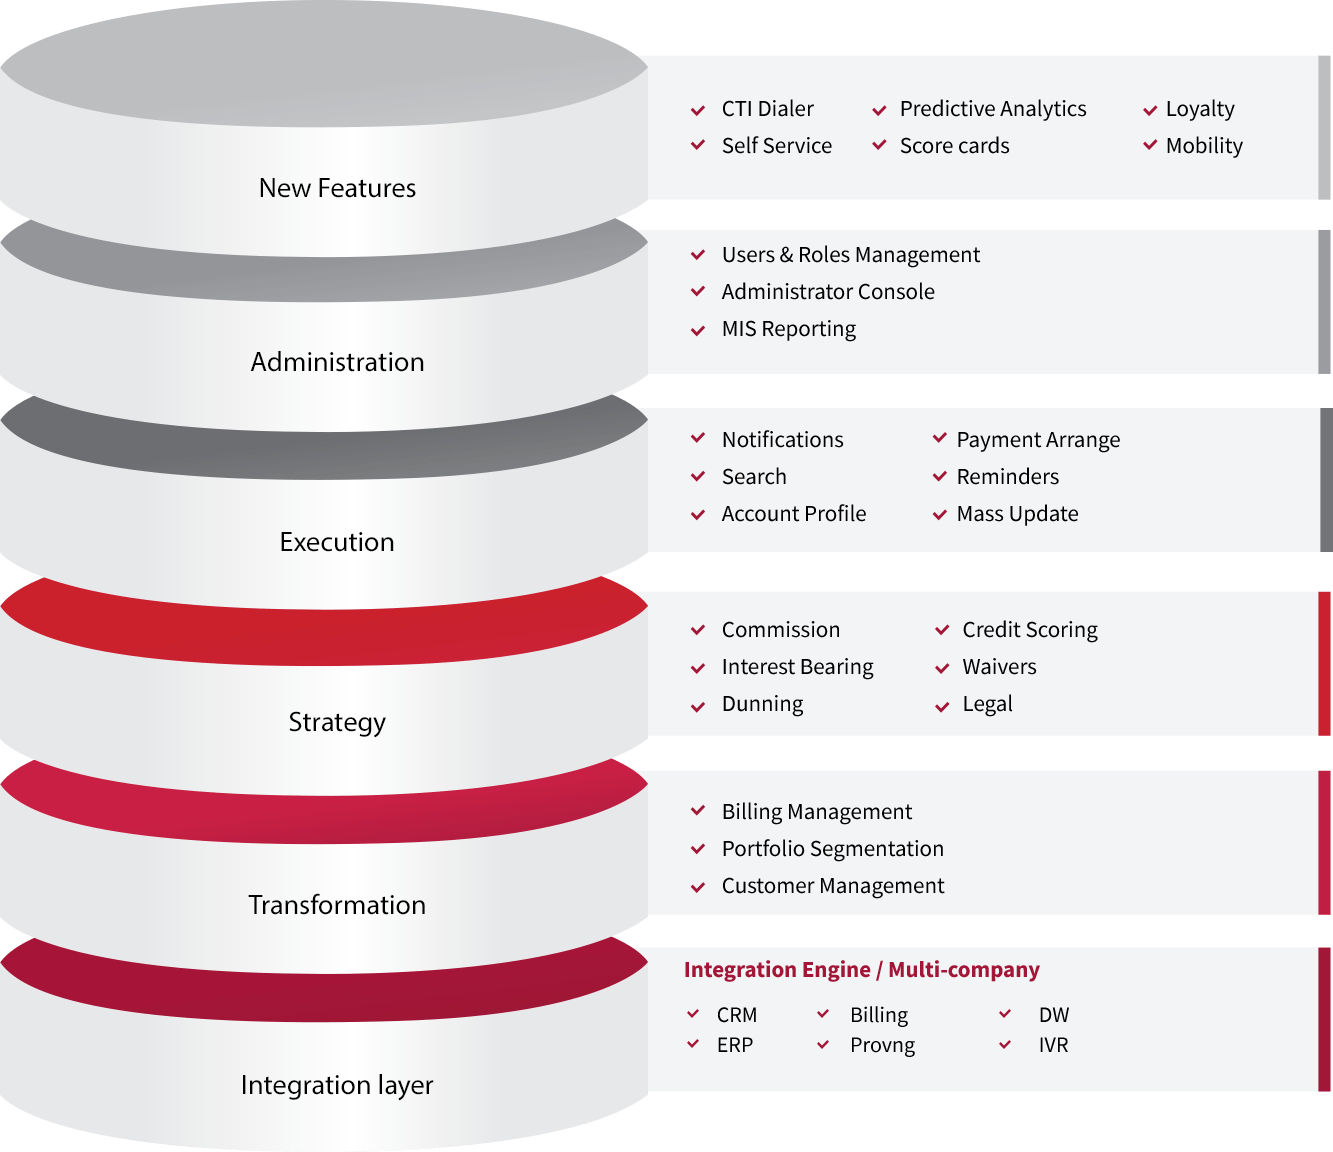 Integration layer